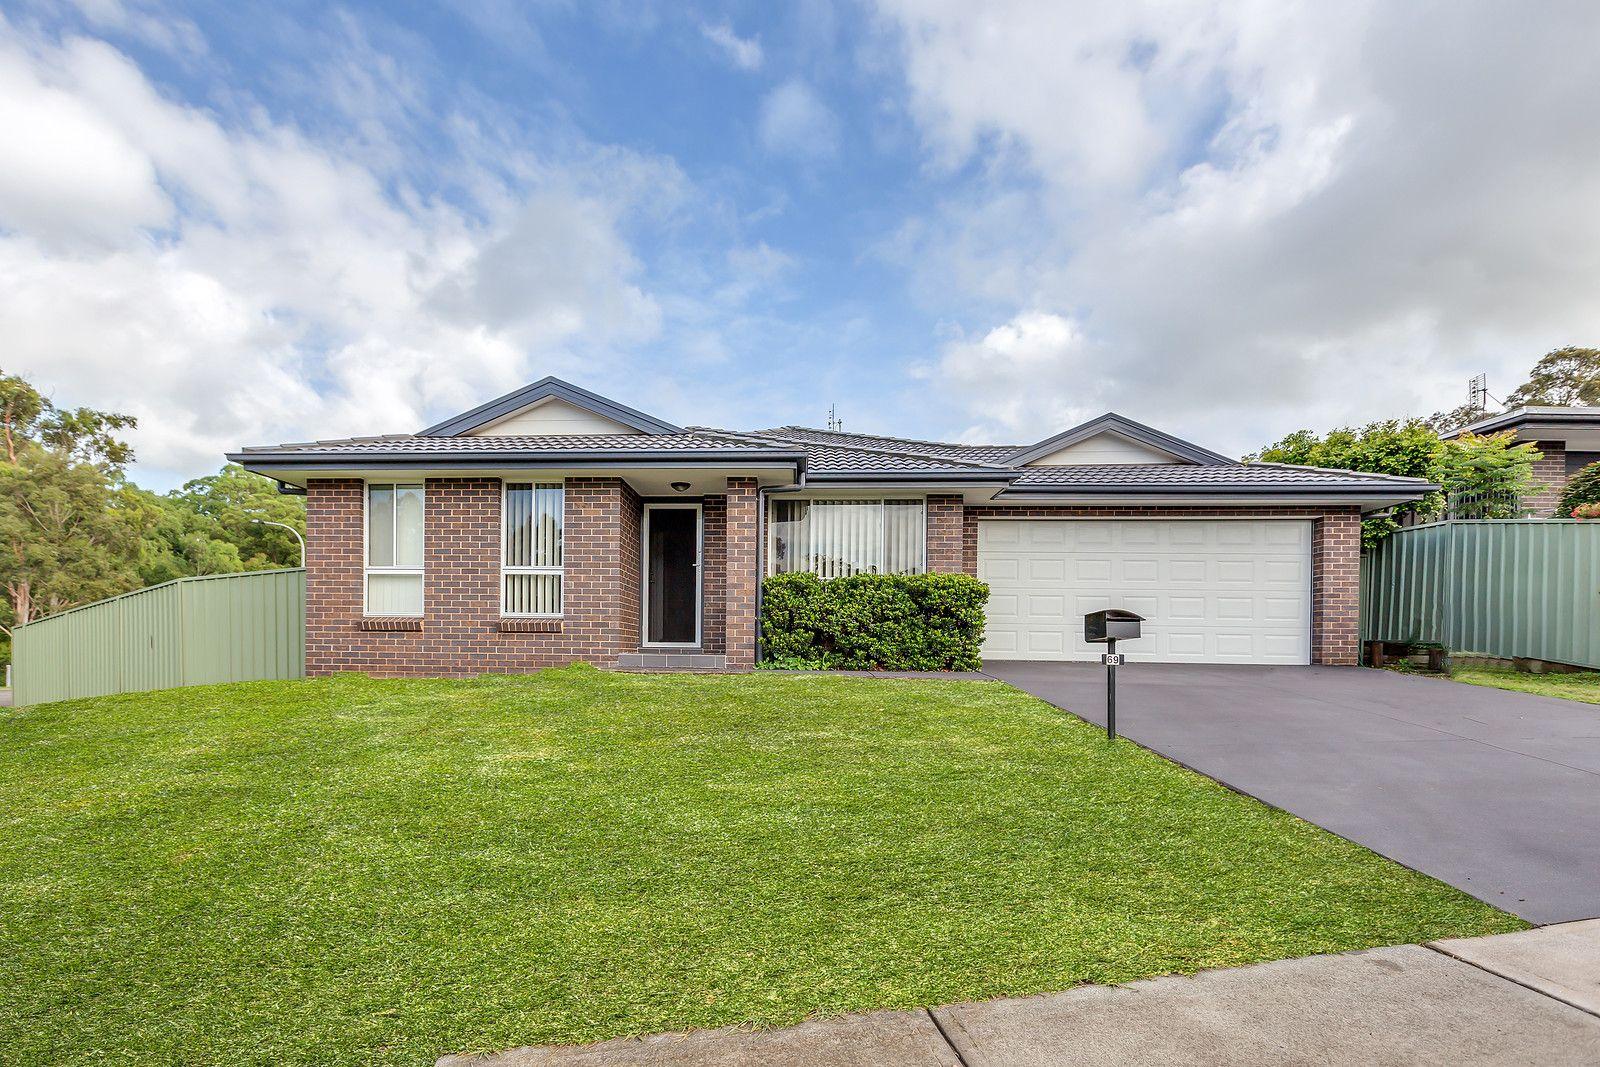 69 Magnetic Drive, Ashtonfield NSW 2323, Image 0